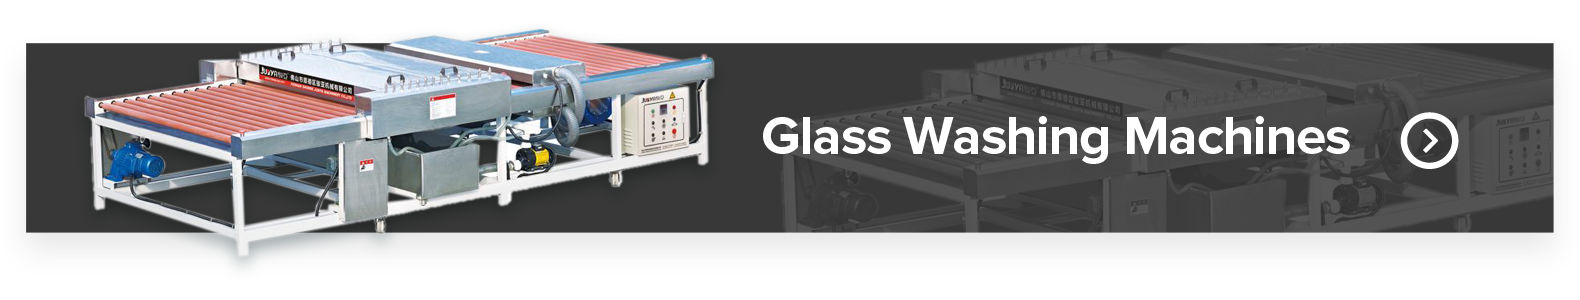 GlassMac Glass Washing Machines